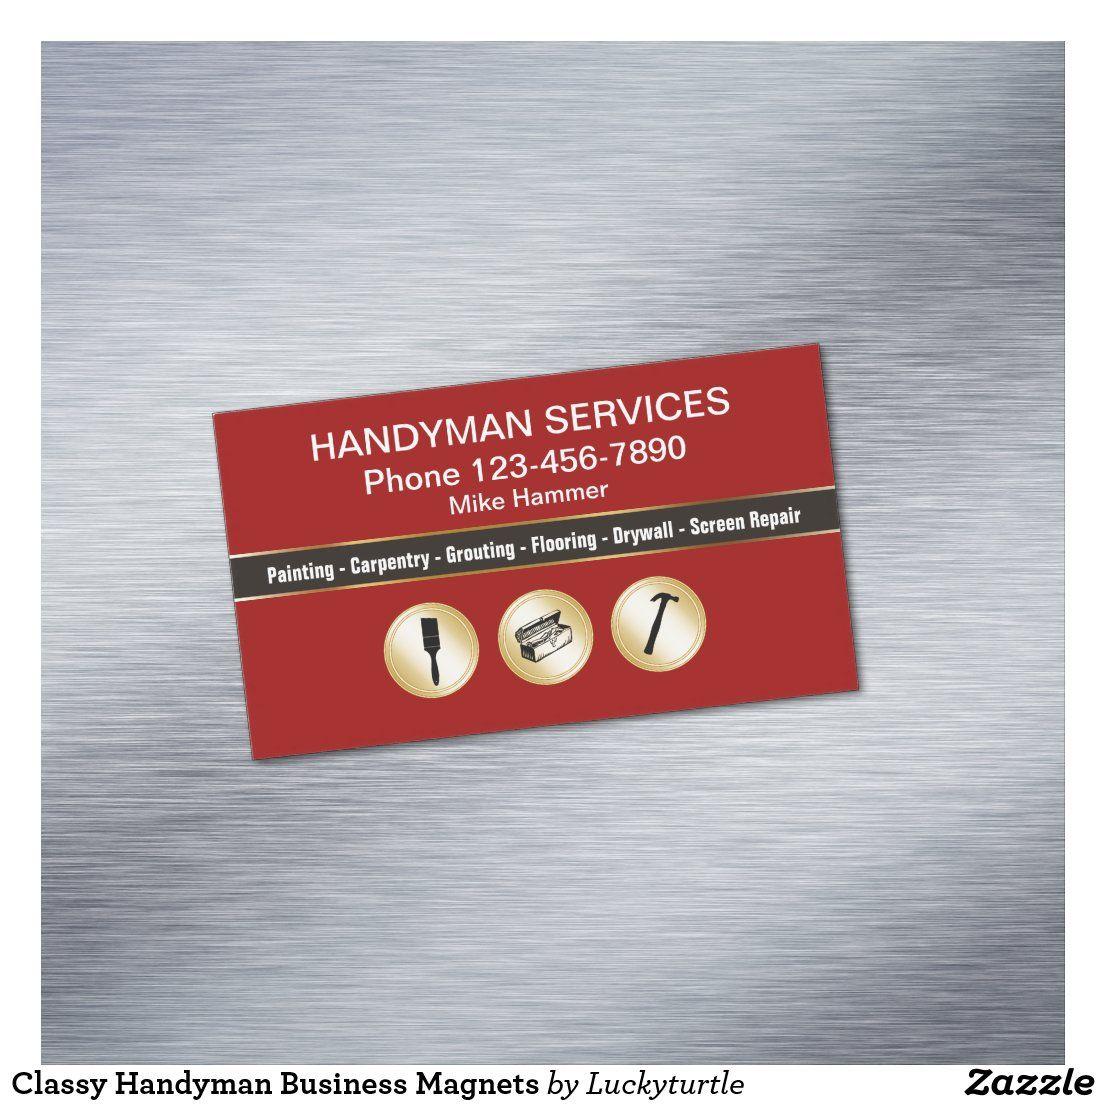 Classy handyman business in 2020